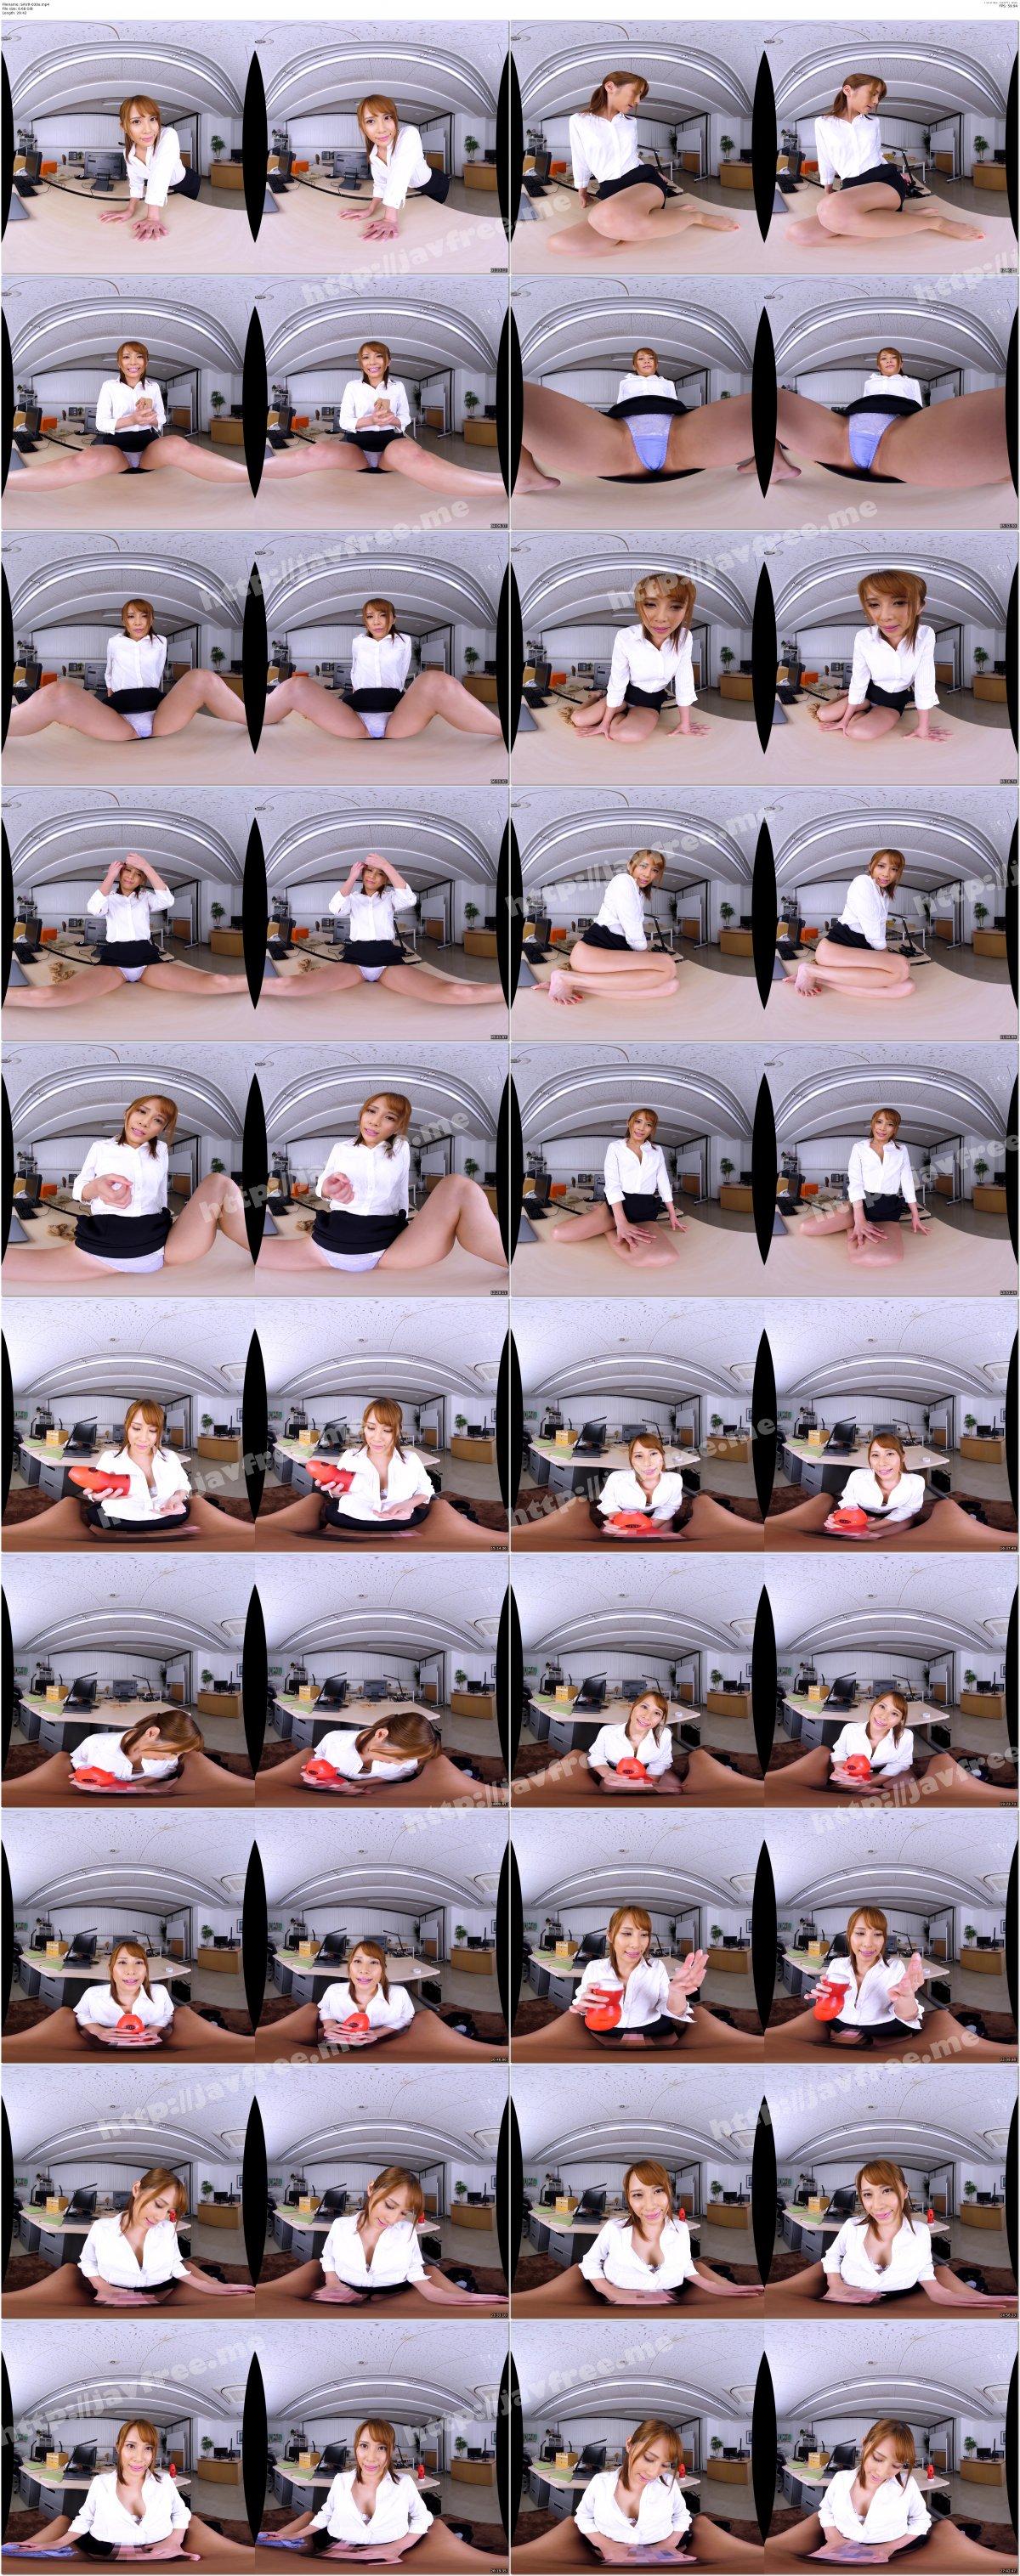 [SAVR-030] 【VR】どぴゅっ×9 連続射精 花咲いあん - image SAVR-030a on https://javfree.me